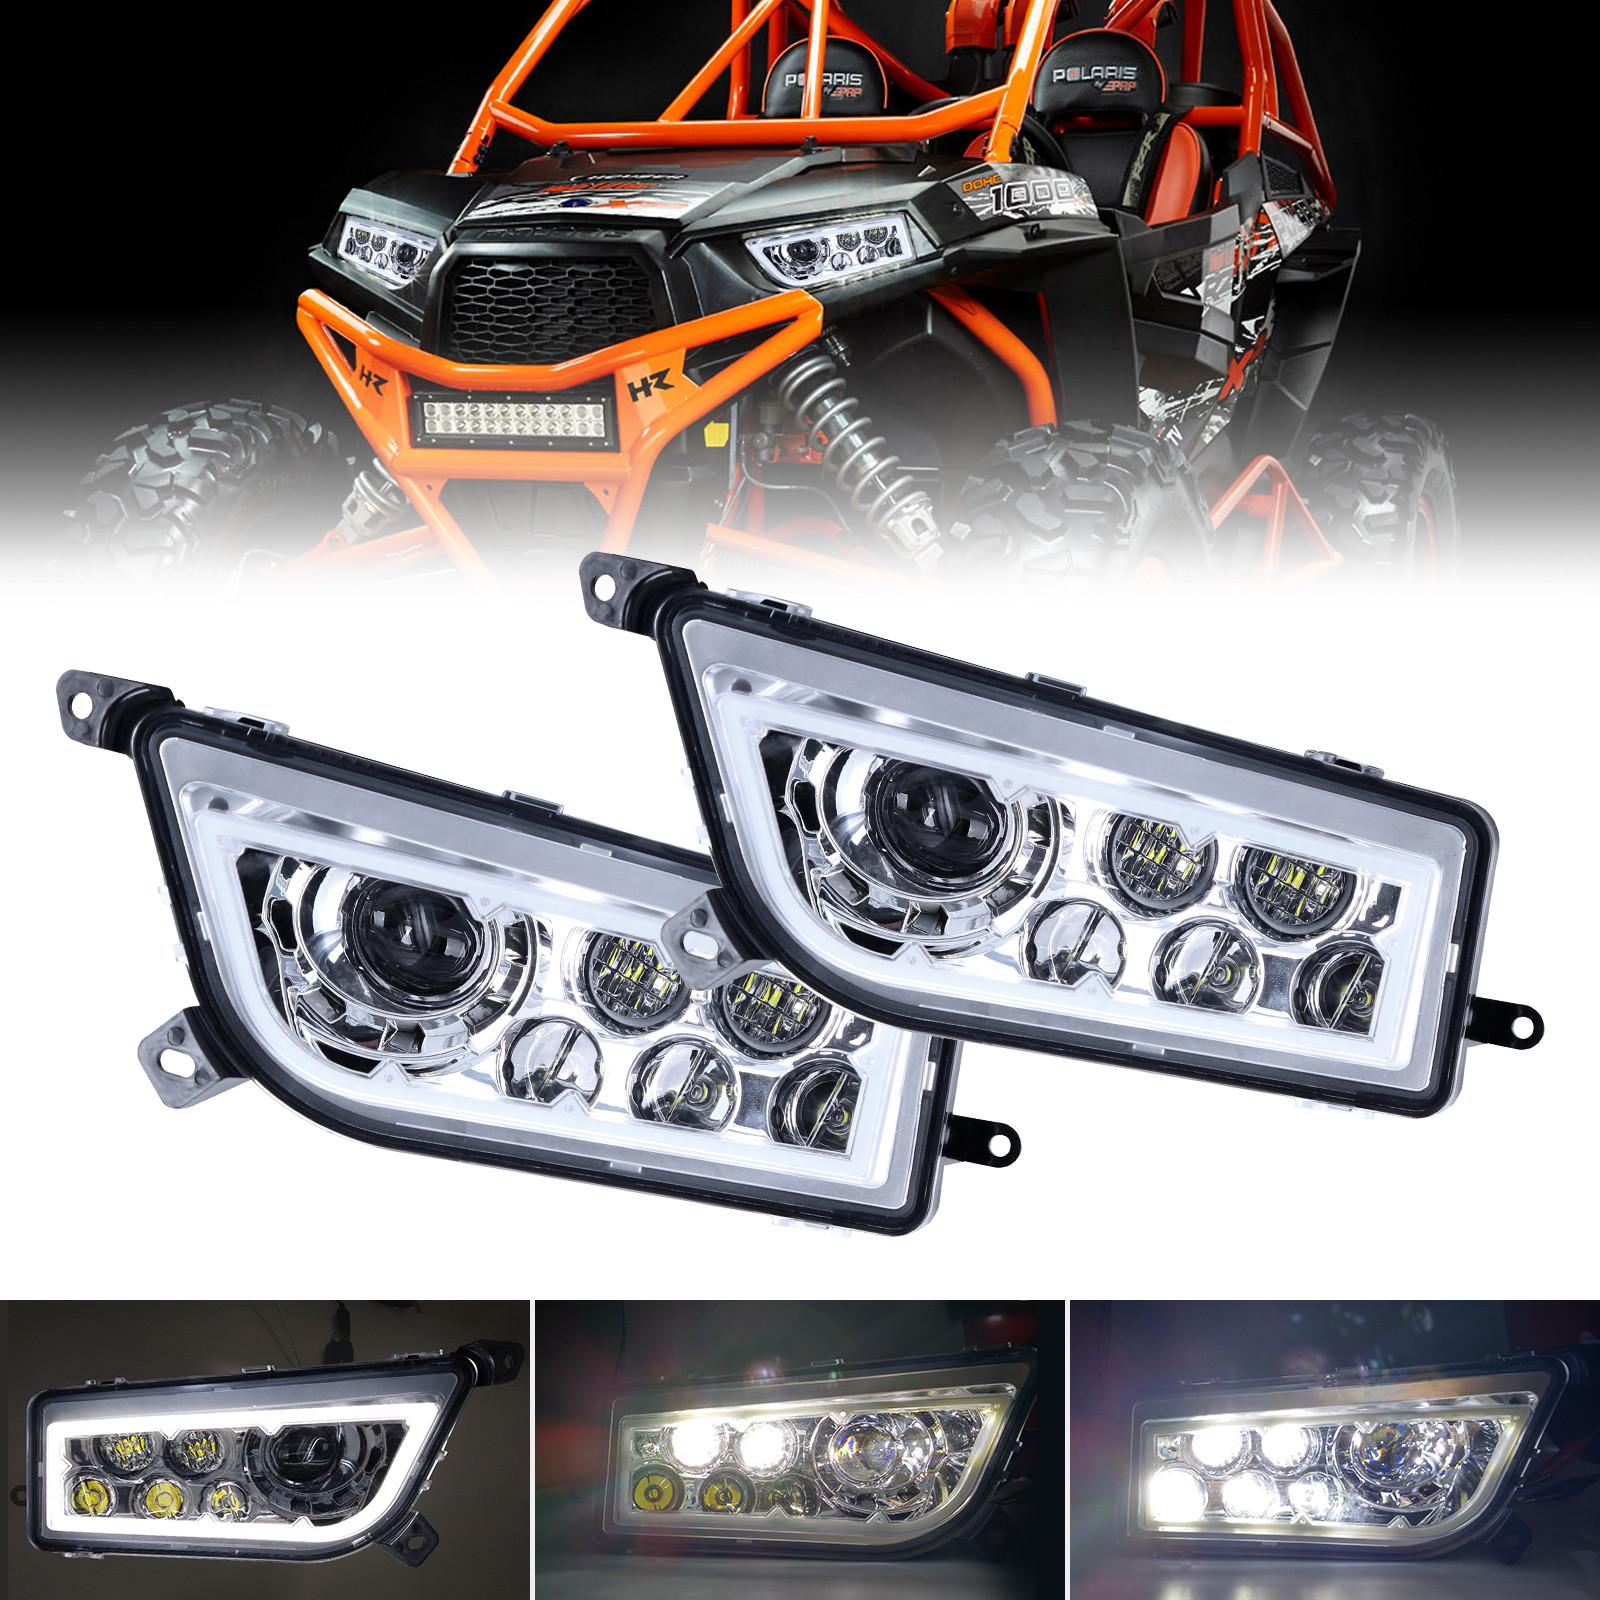 SOYAVISION 2Pcs Black LED Headlight Kit High//Low Beam for Polaris Sportsman Ranger RZR XP 900 ATV Off Road Headlamps